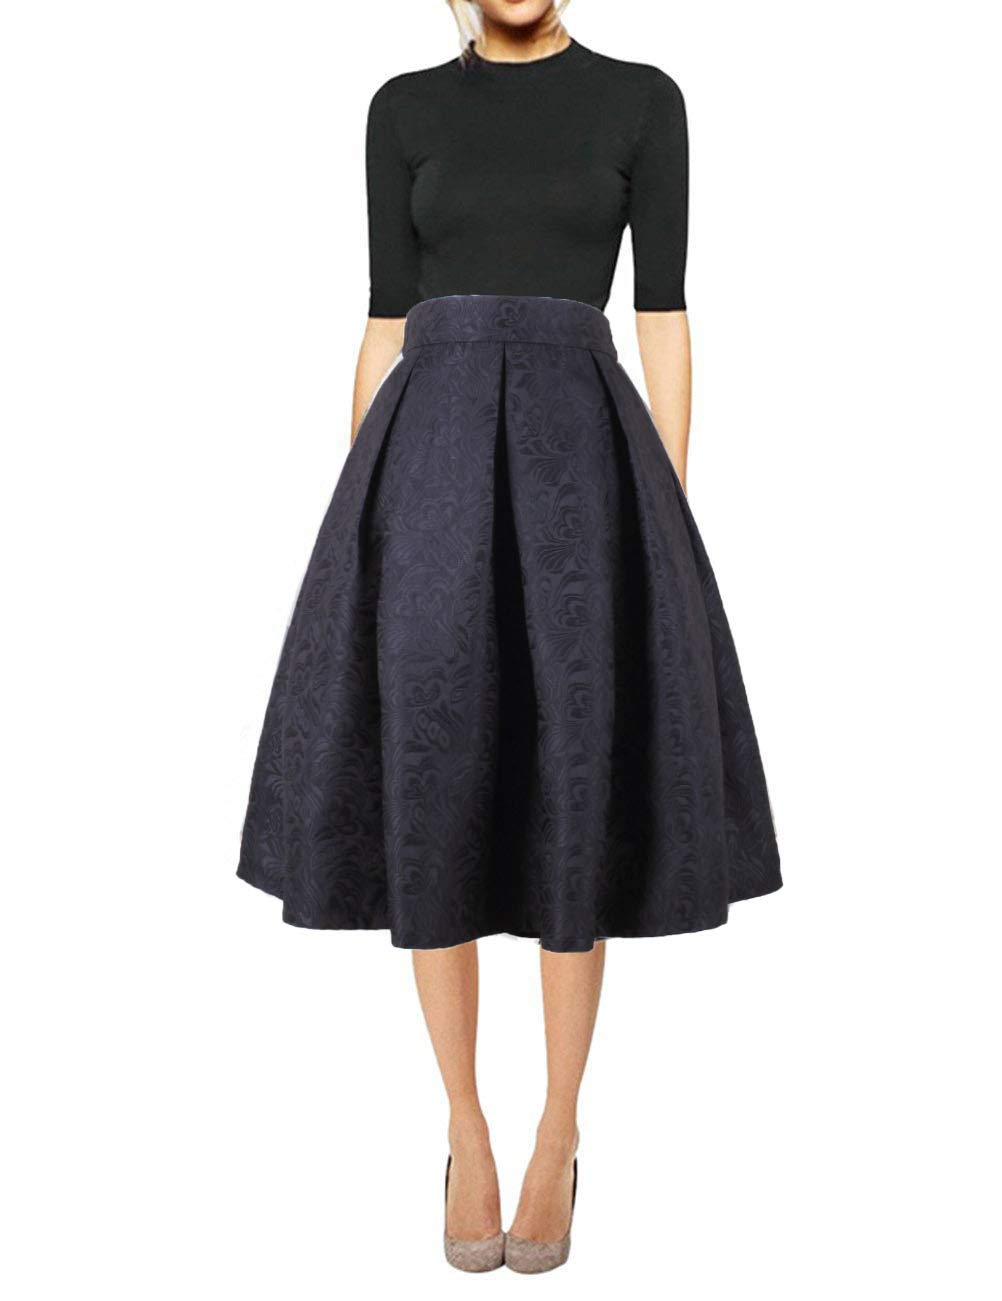 7419ba7a46 Galleon - Hanlolo Women Knee Length Floral Skirt Pleated Flared Midi Circl Skirts  Dress